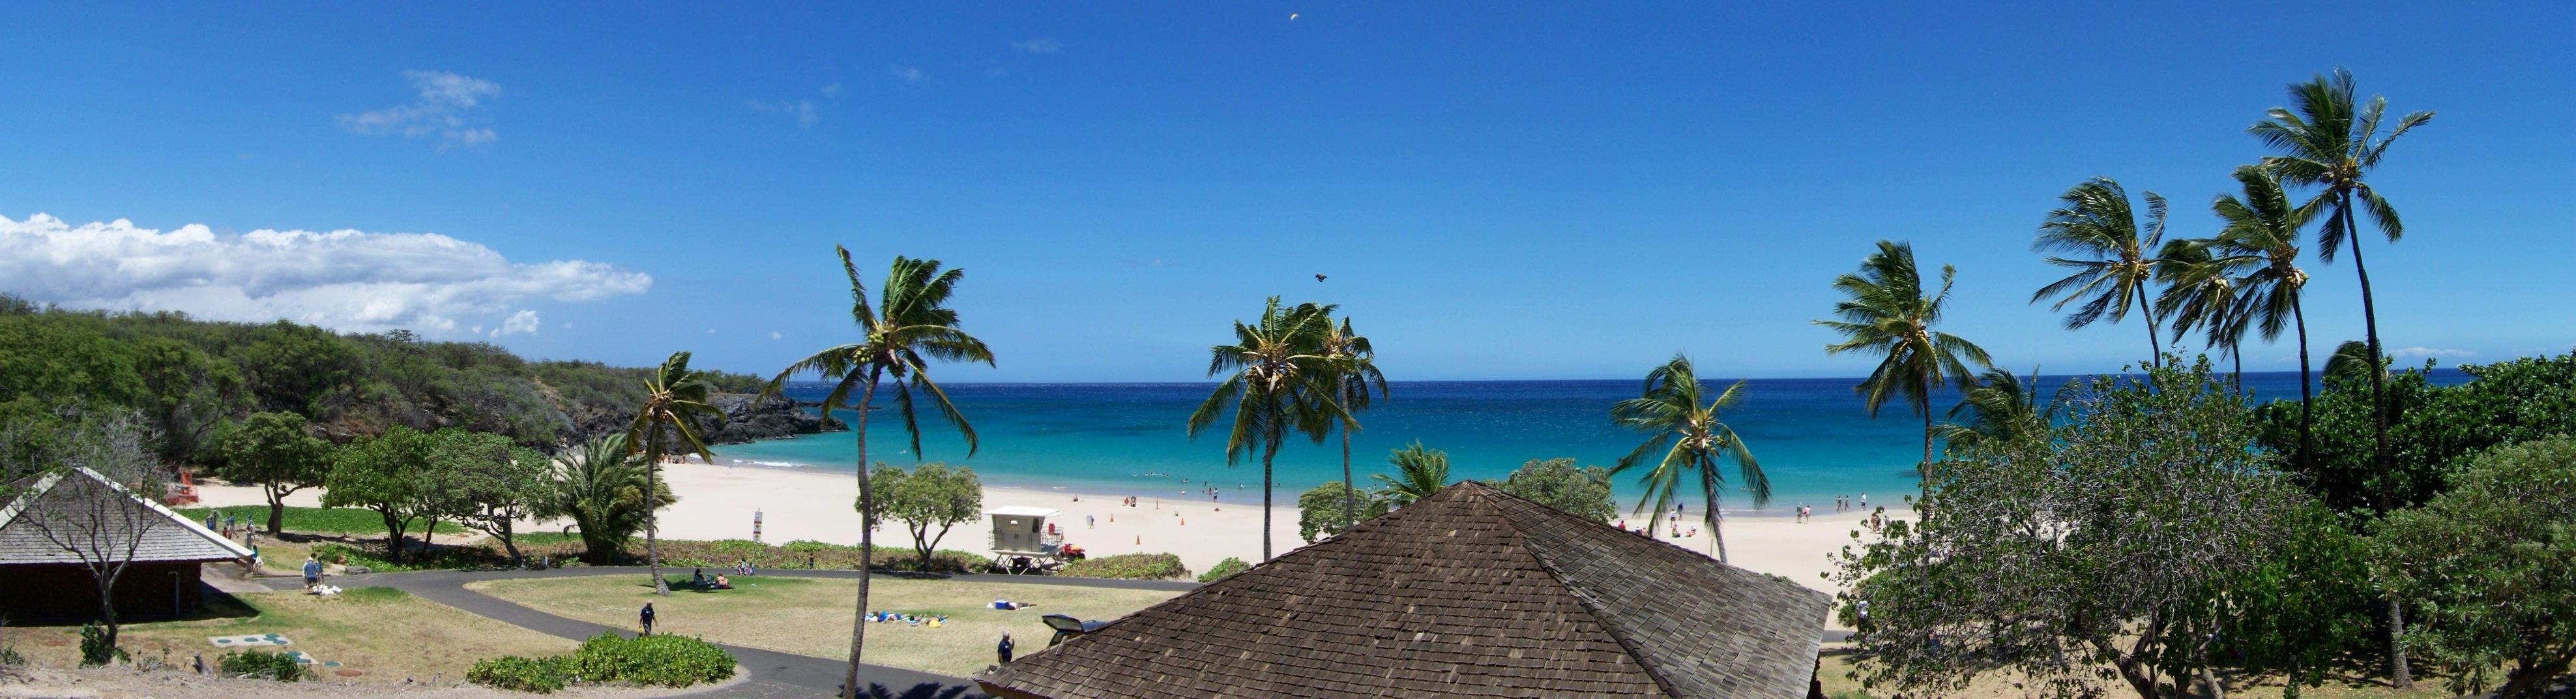 Hawaii Beach Hotel Cyprus